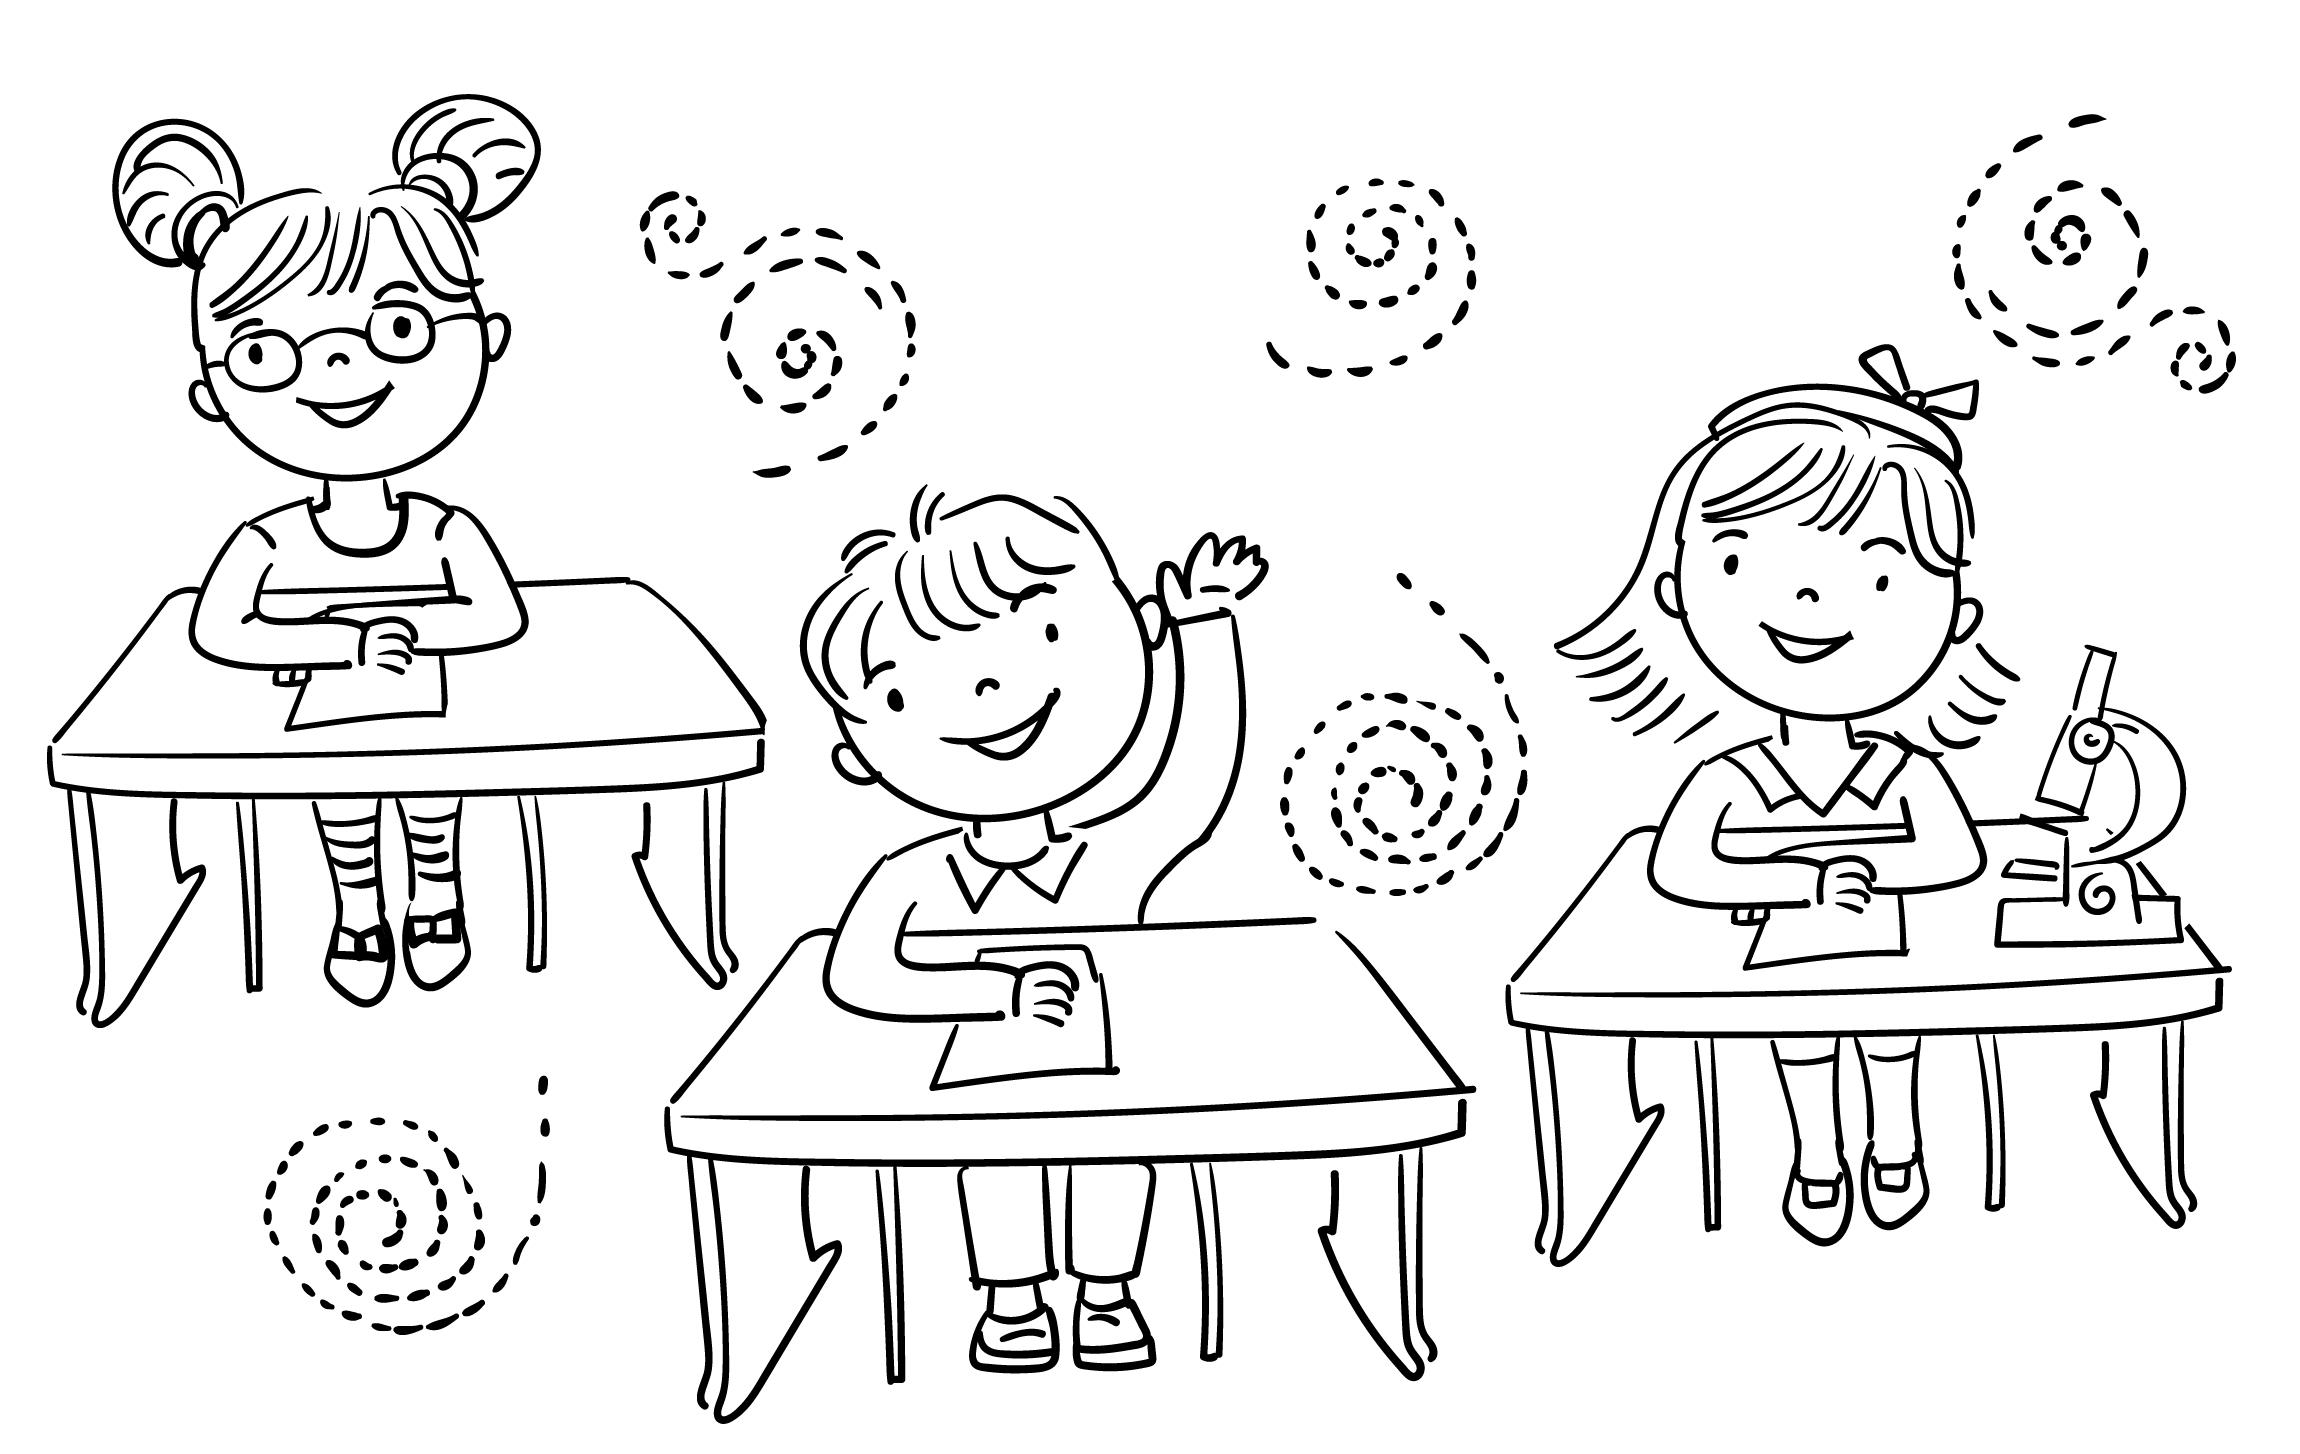 Ausmalbilder Schulanfang - 1Ausmalbilder bestimmt für Schulanfang Ausmalbilder